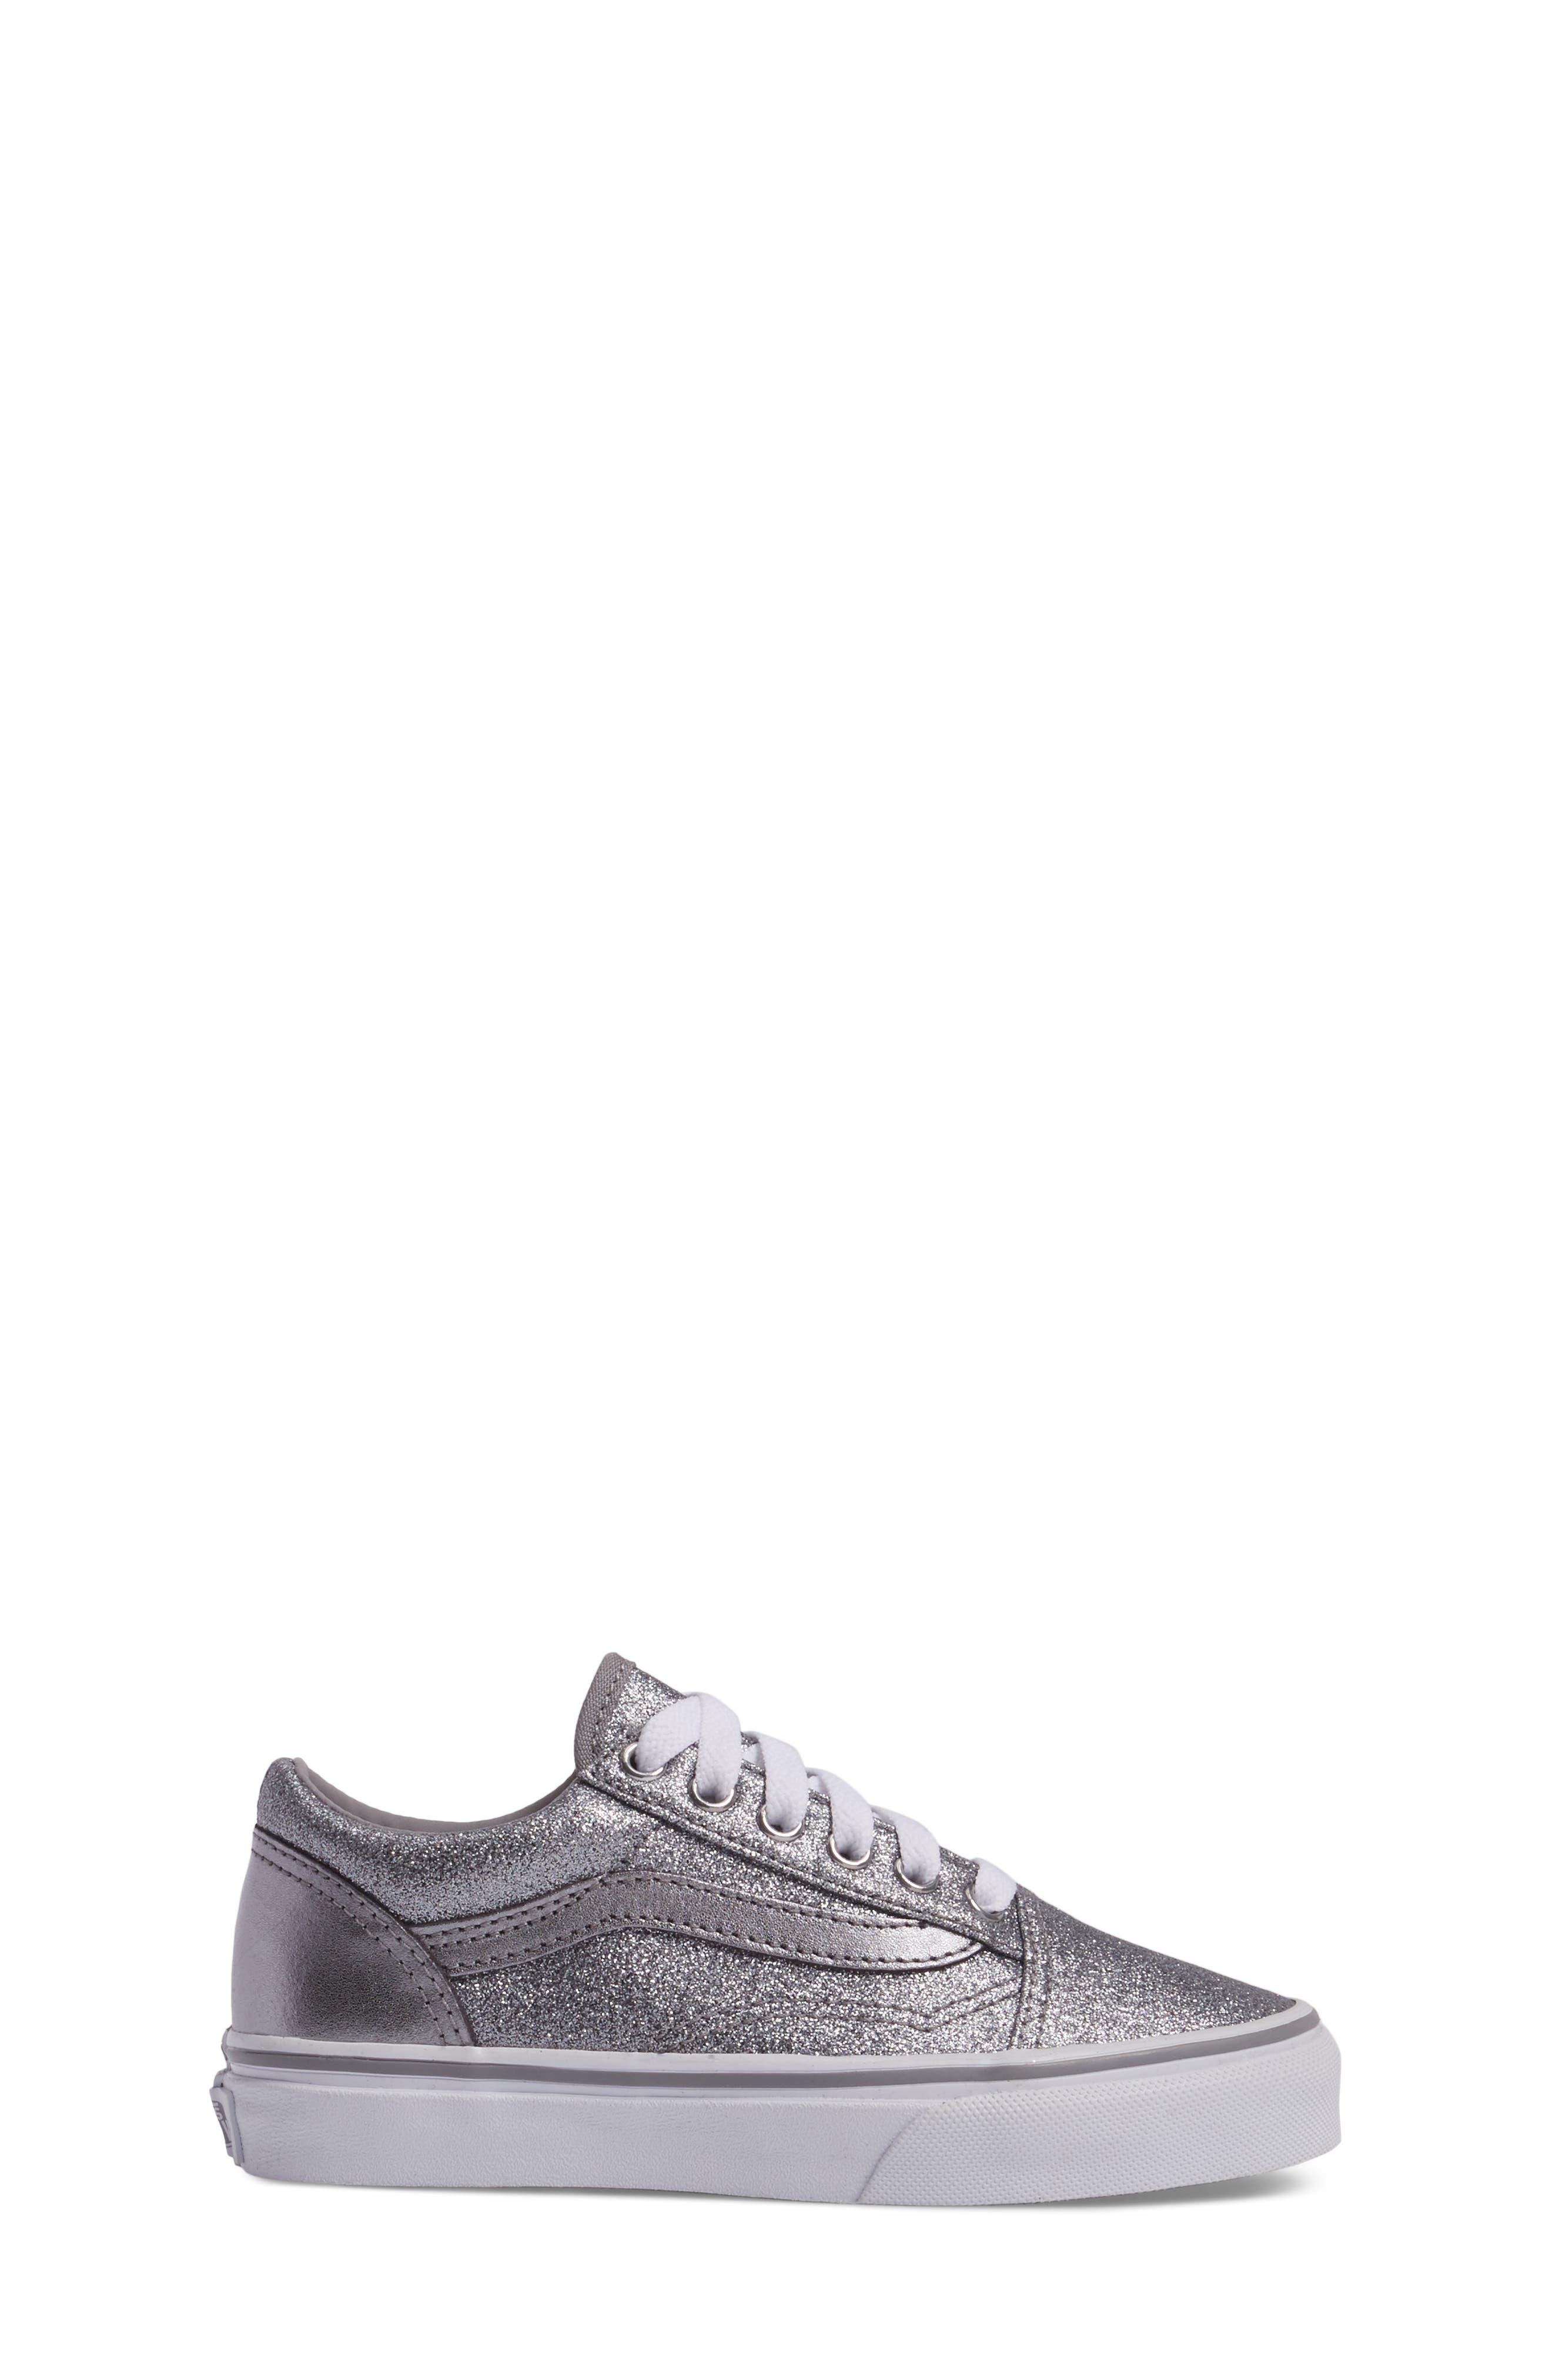 Alternate Image 3  - Vans Old Skool Glitter Sneaker (Toddler, Little Kid & Big Kid)